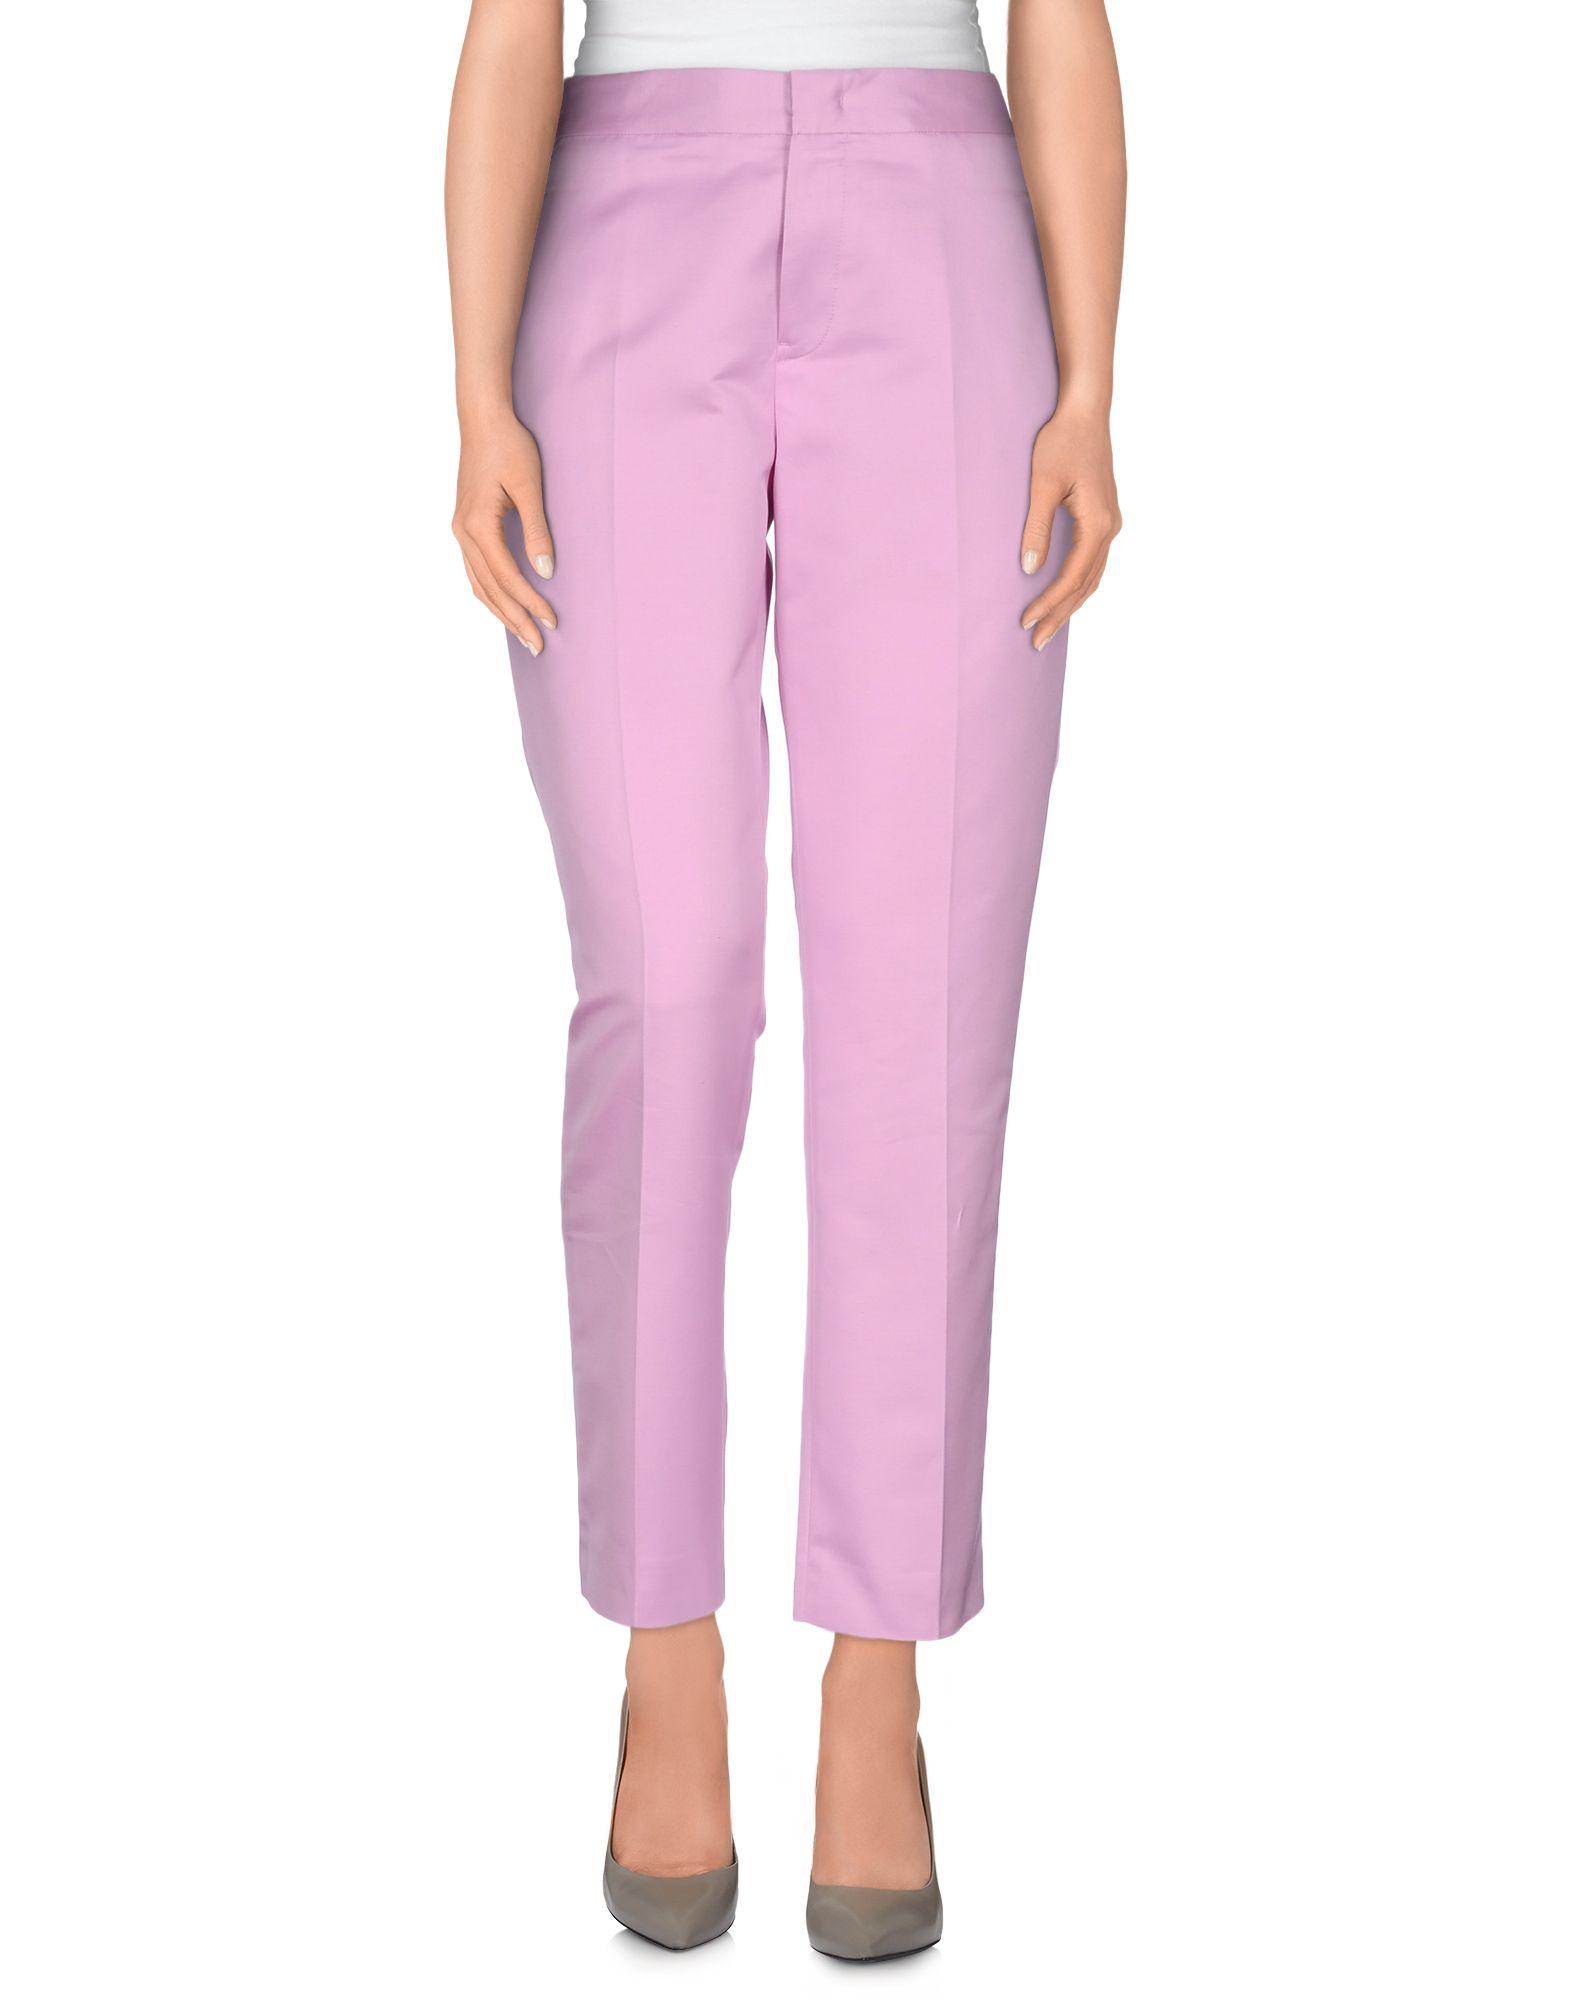 Pantalone Jil Sander Donna - Acquista online su w2jio